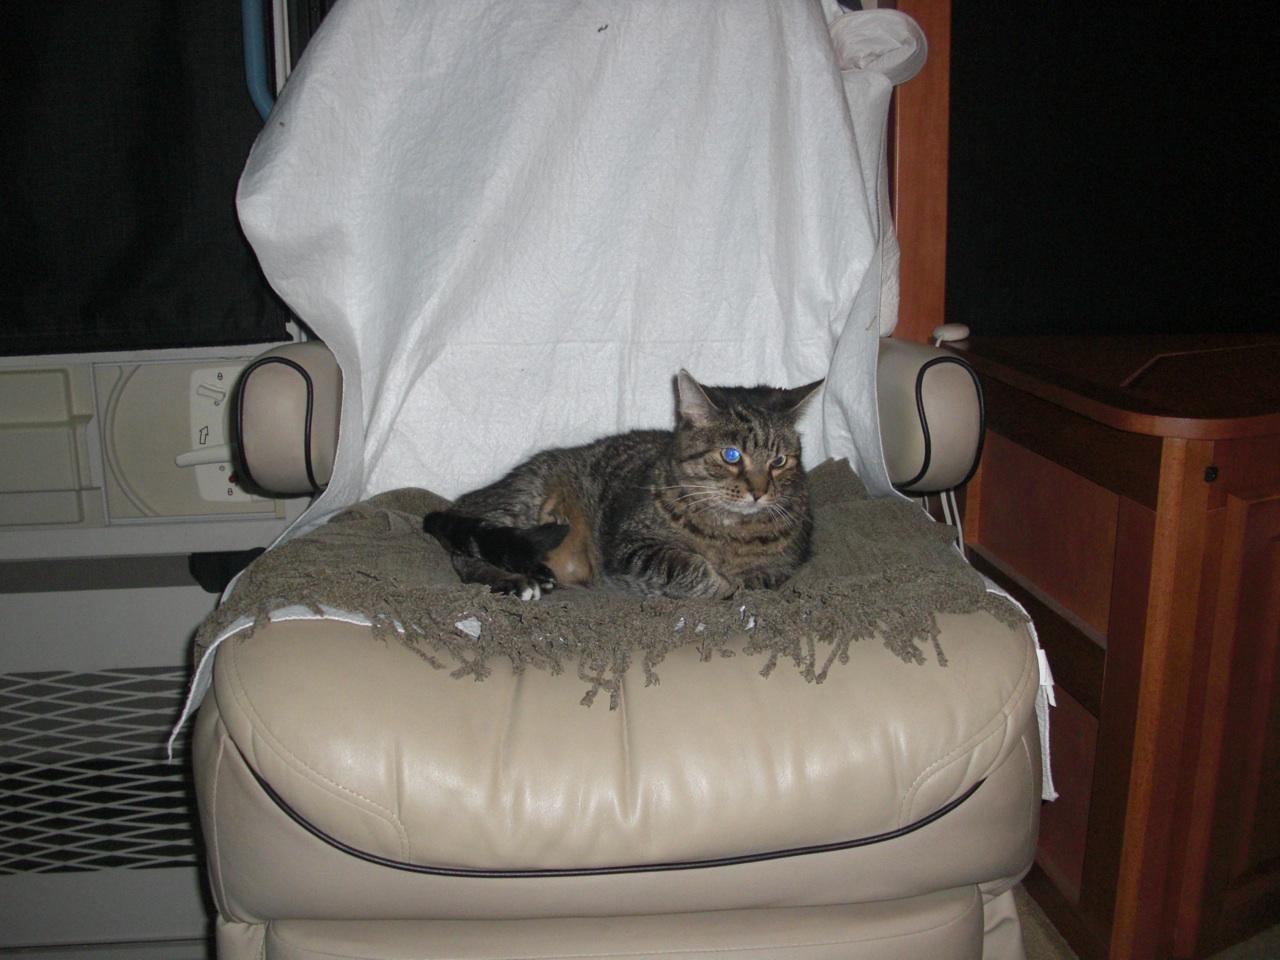 Whisper On Passenger Chair Deciding If He Wants To Sleep